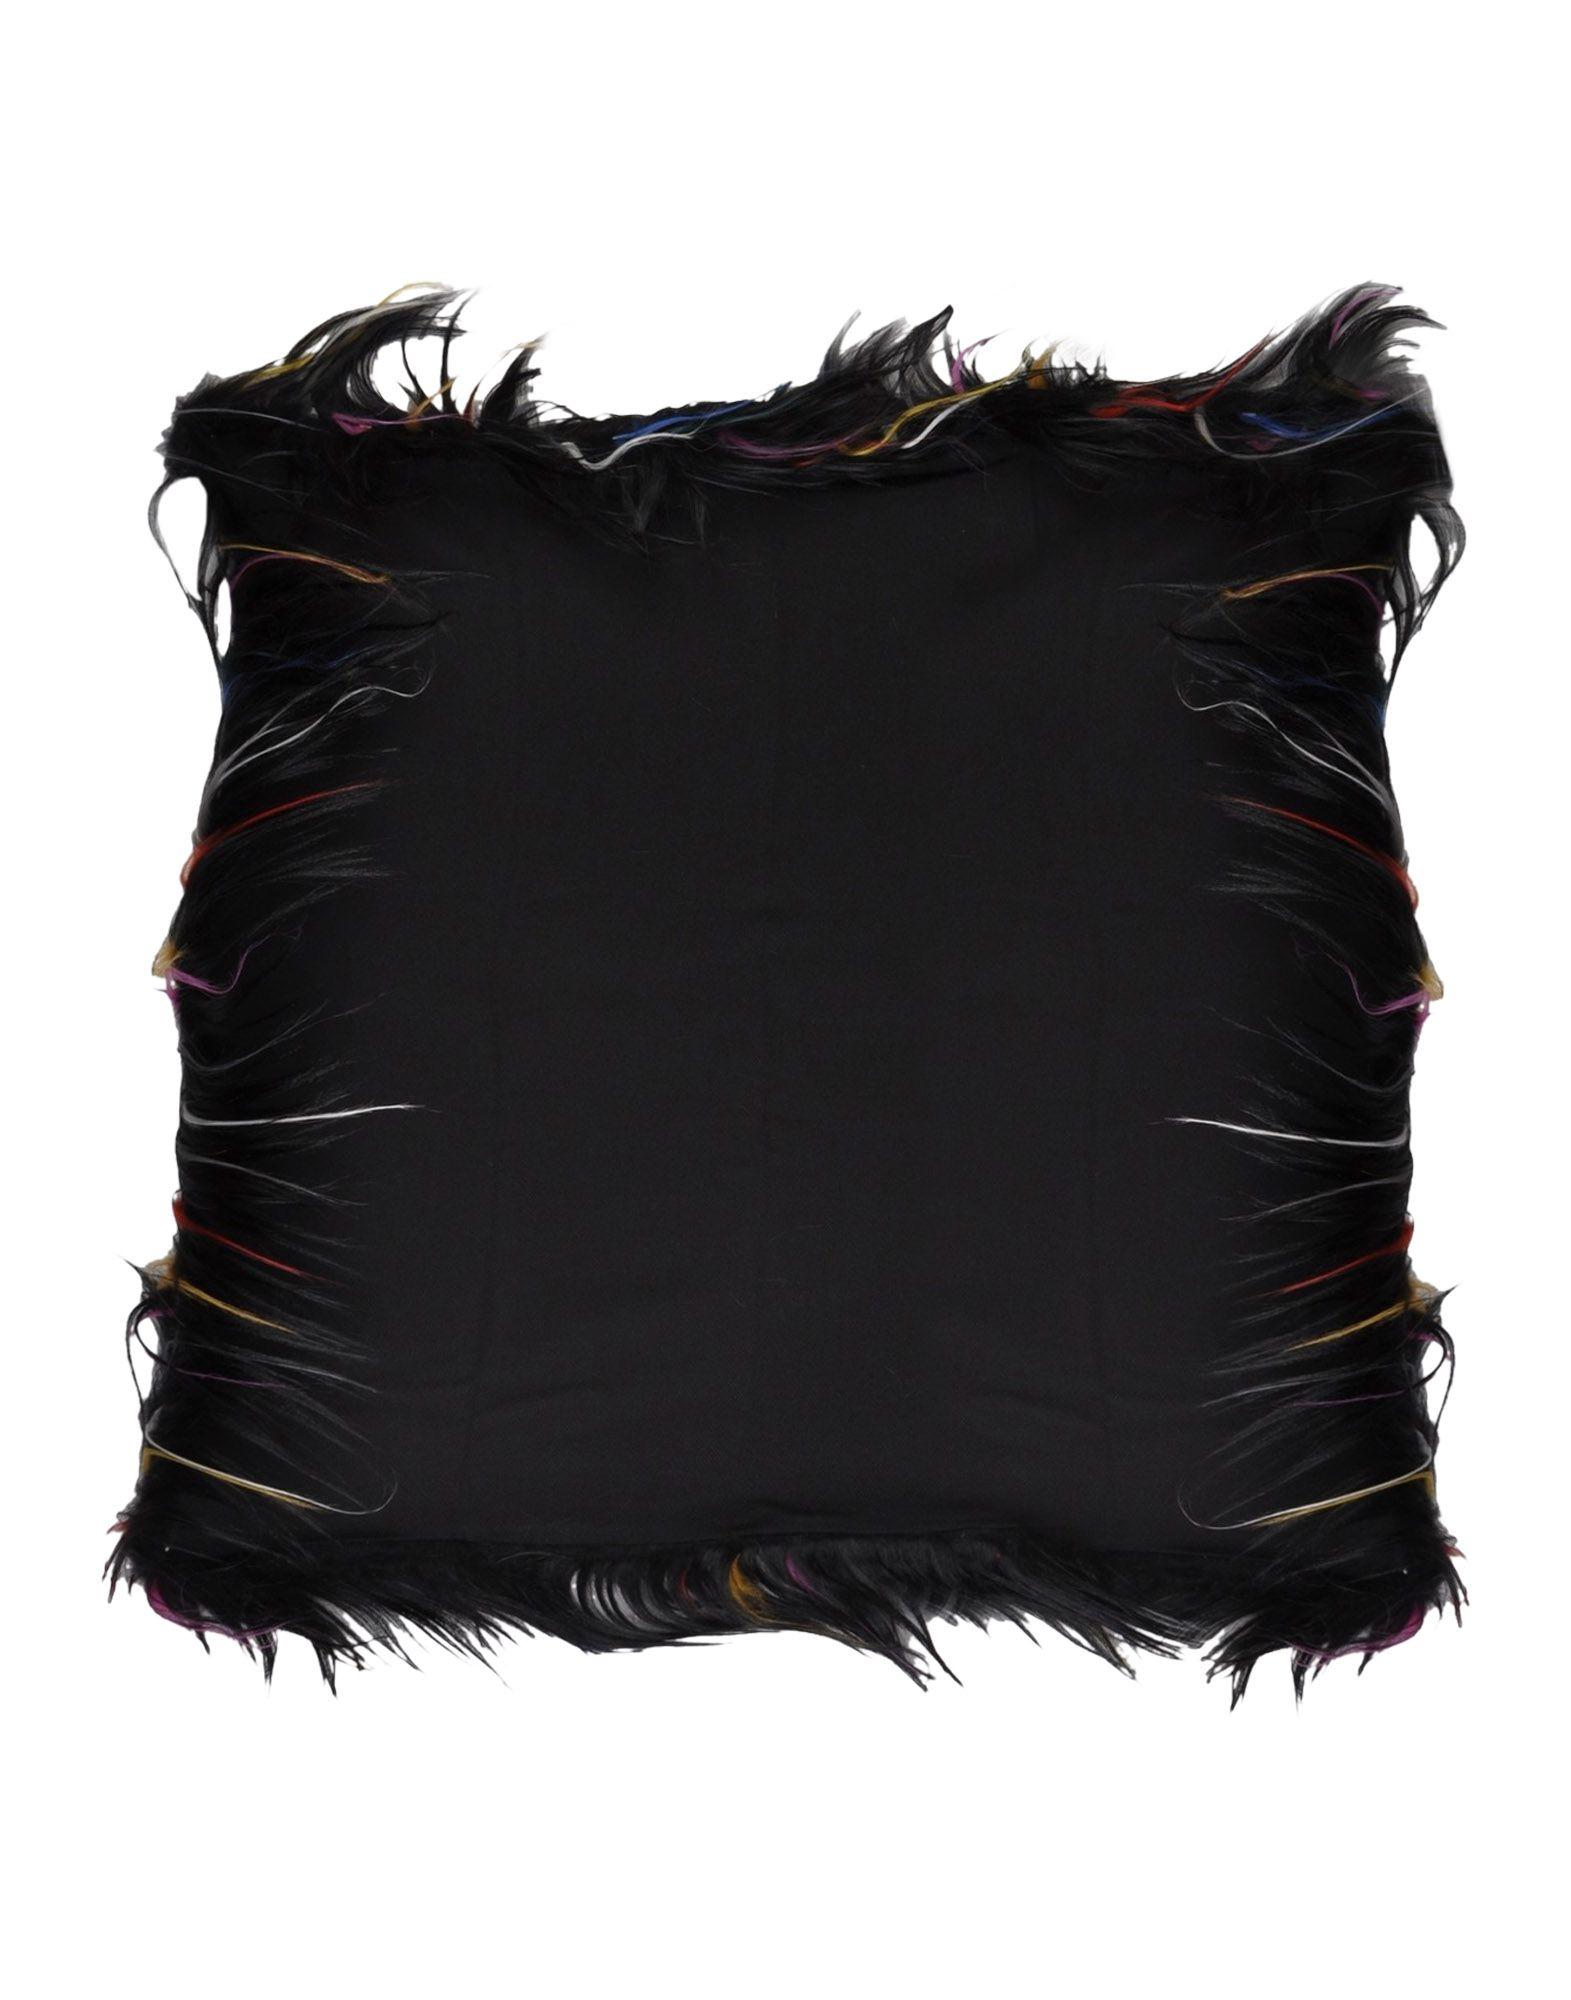 GIORGIO ARMANI Платок платок armani jeans 924174 7a111 00020